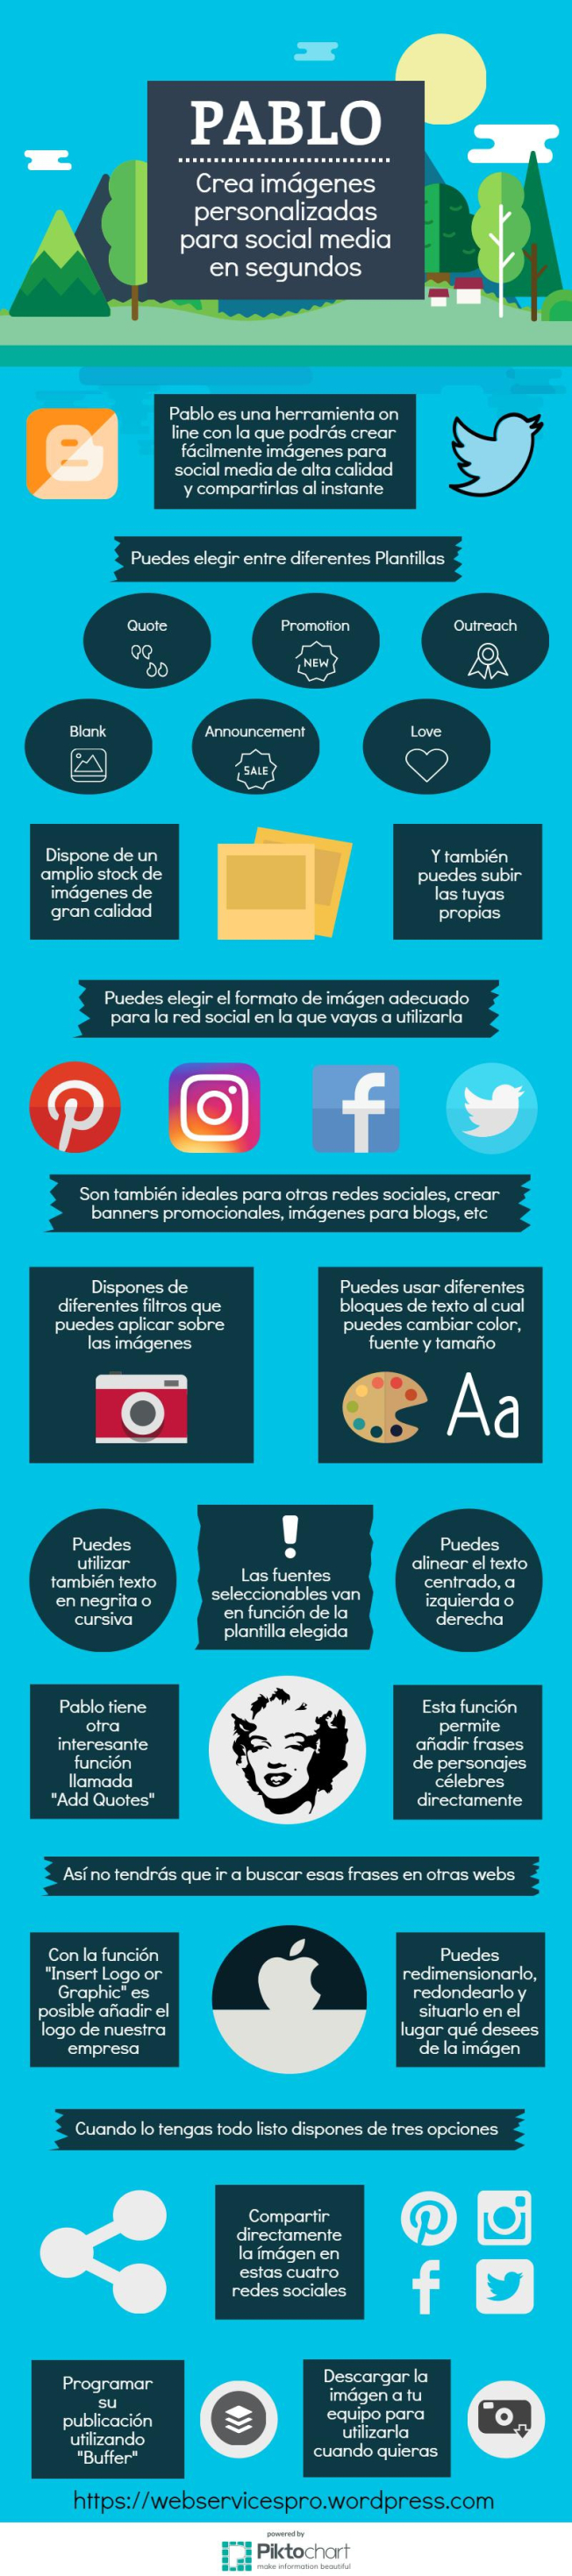 pablo-contenidos-visuales-infografia